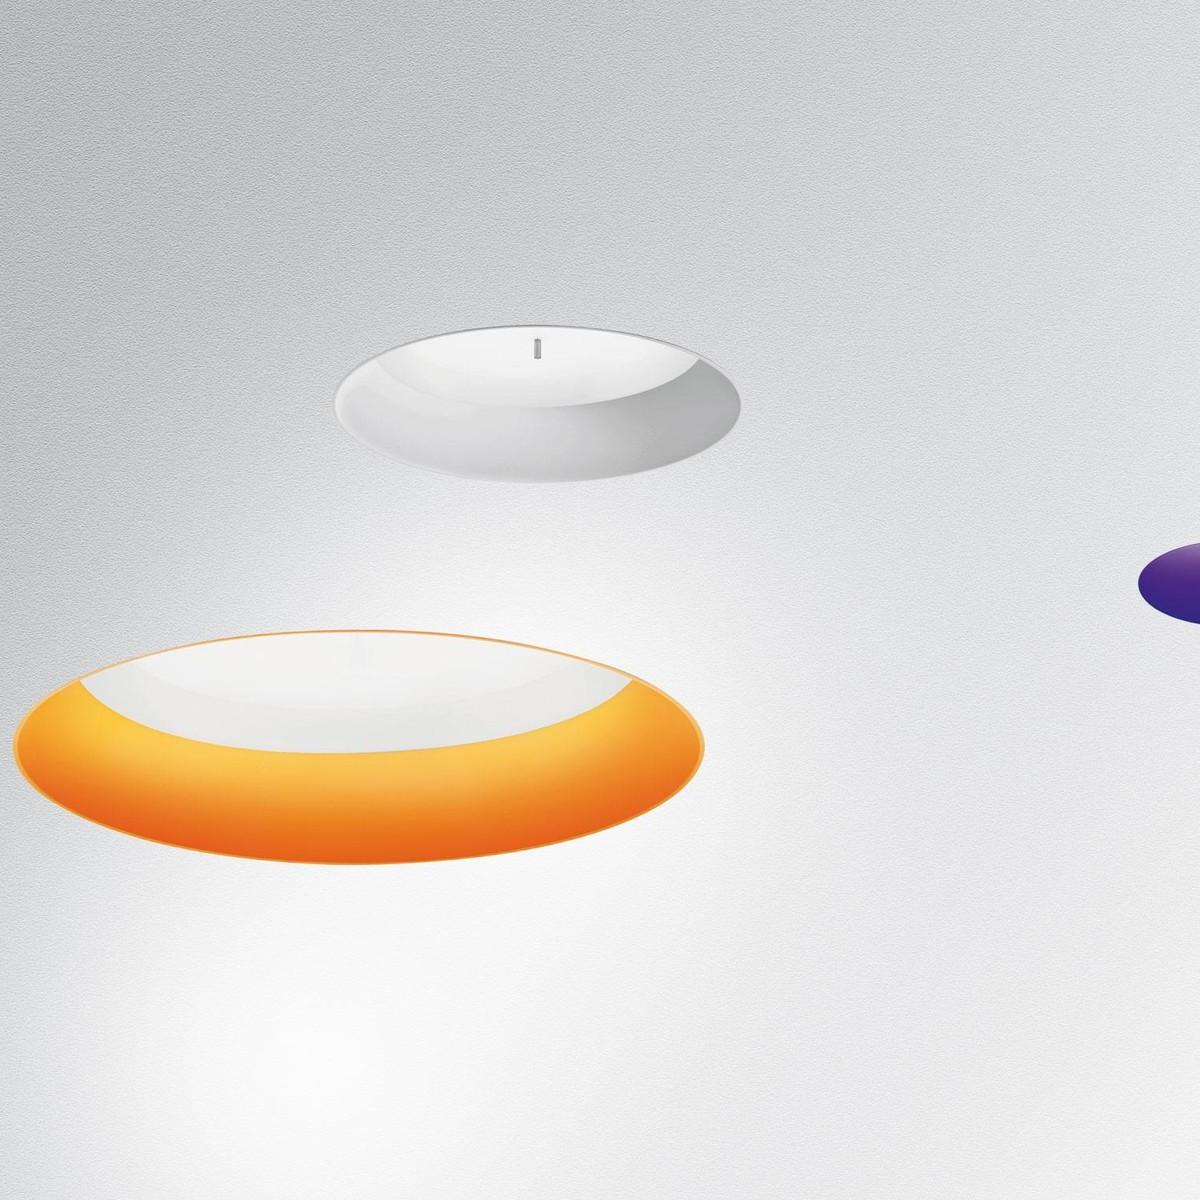 tagora 570 incassco plafondlamp artemide. Black Bedroom Furniture Sets. Home Design Ideas